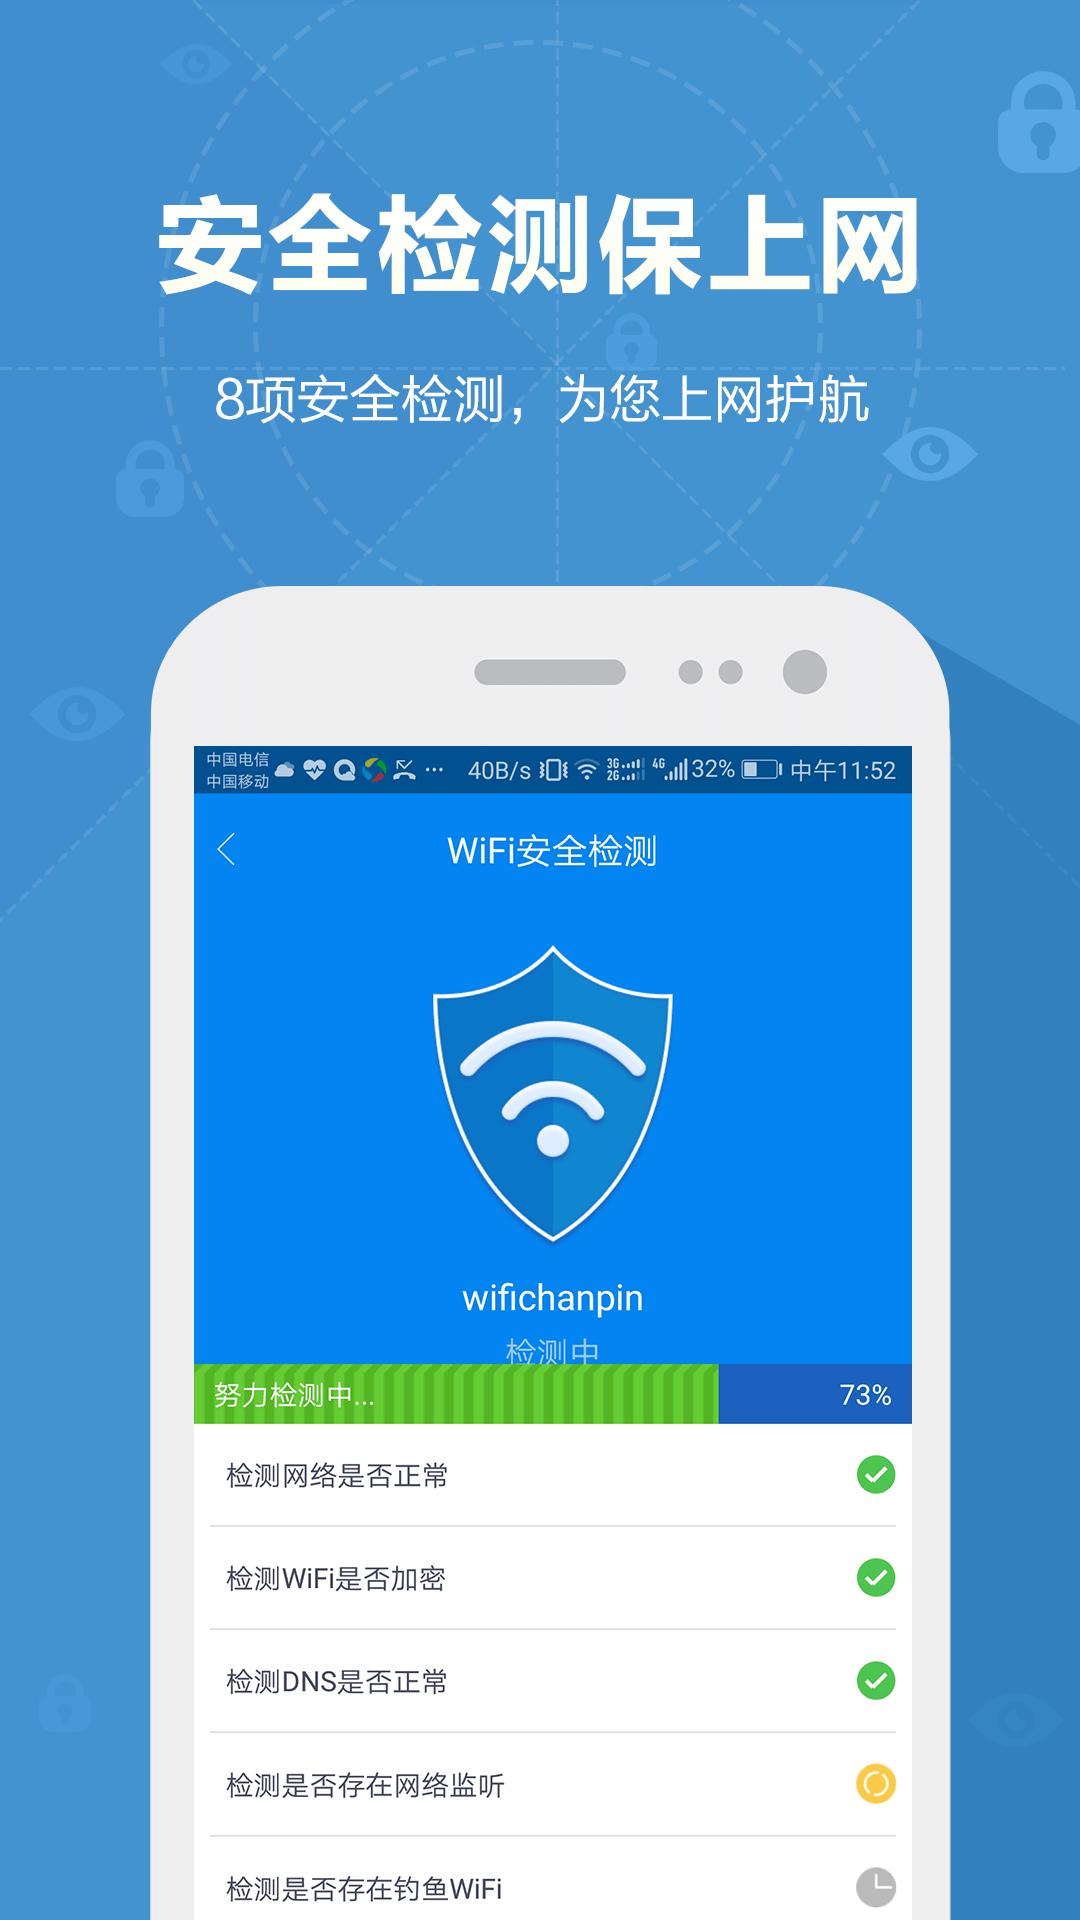 WiFi万能密码-应用截图